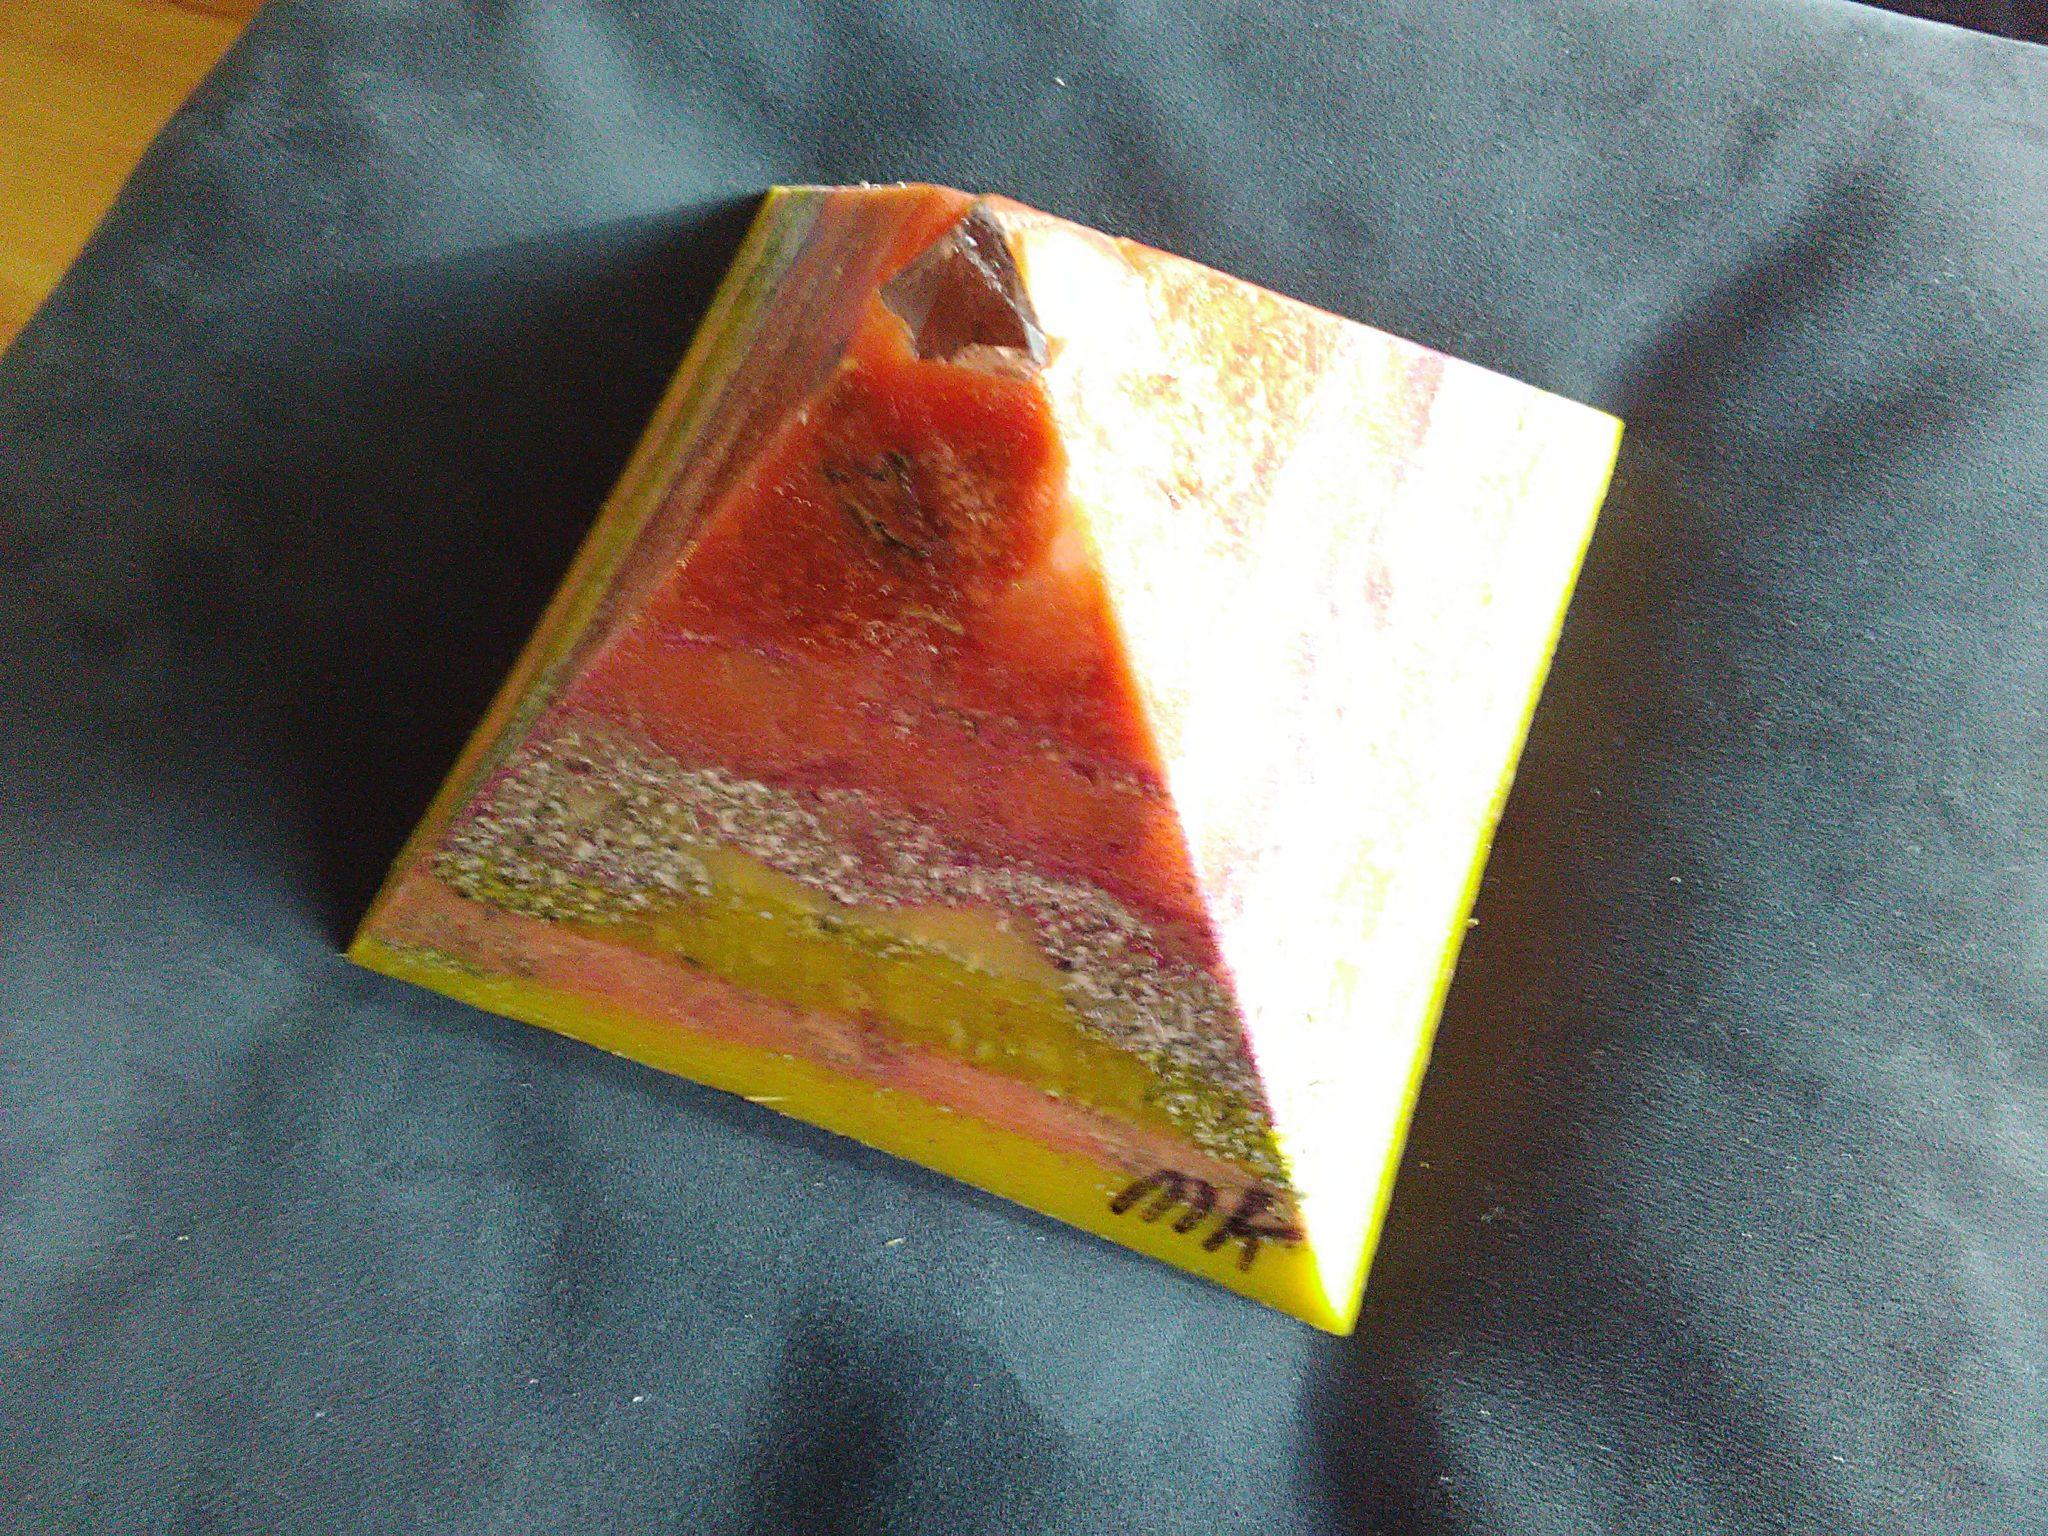 VK Ultra pyramid orgonite